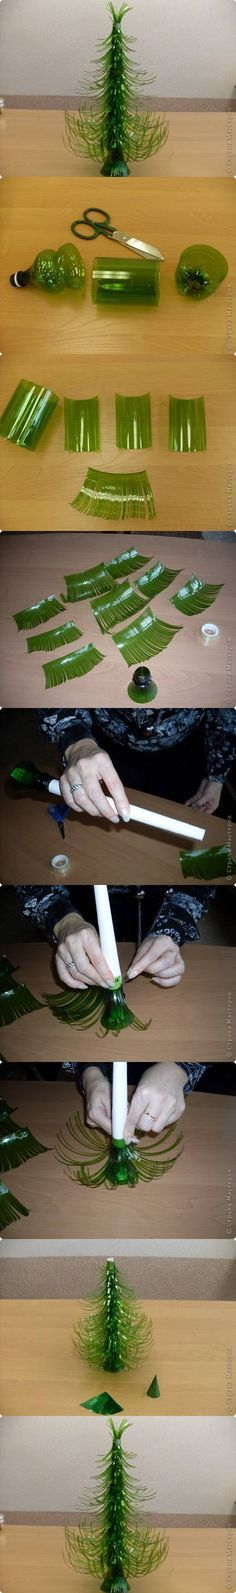 DIY Plastic Bottle Christmas Trees DIY Plastic Bottle Christmas Trees